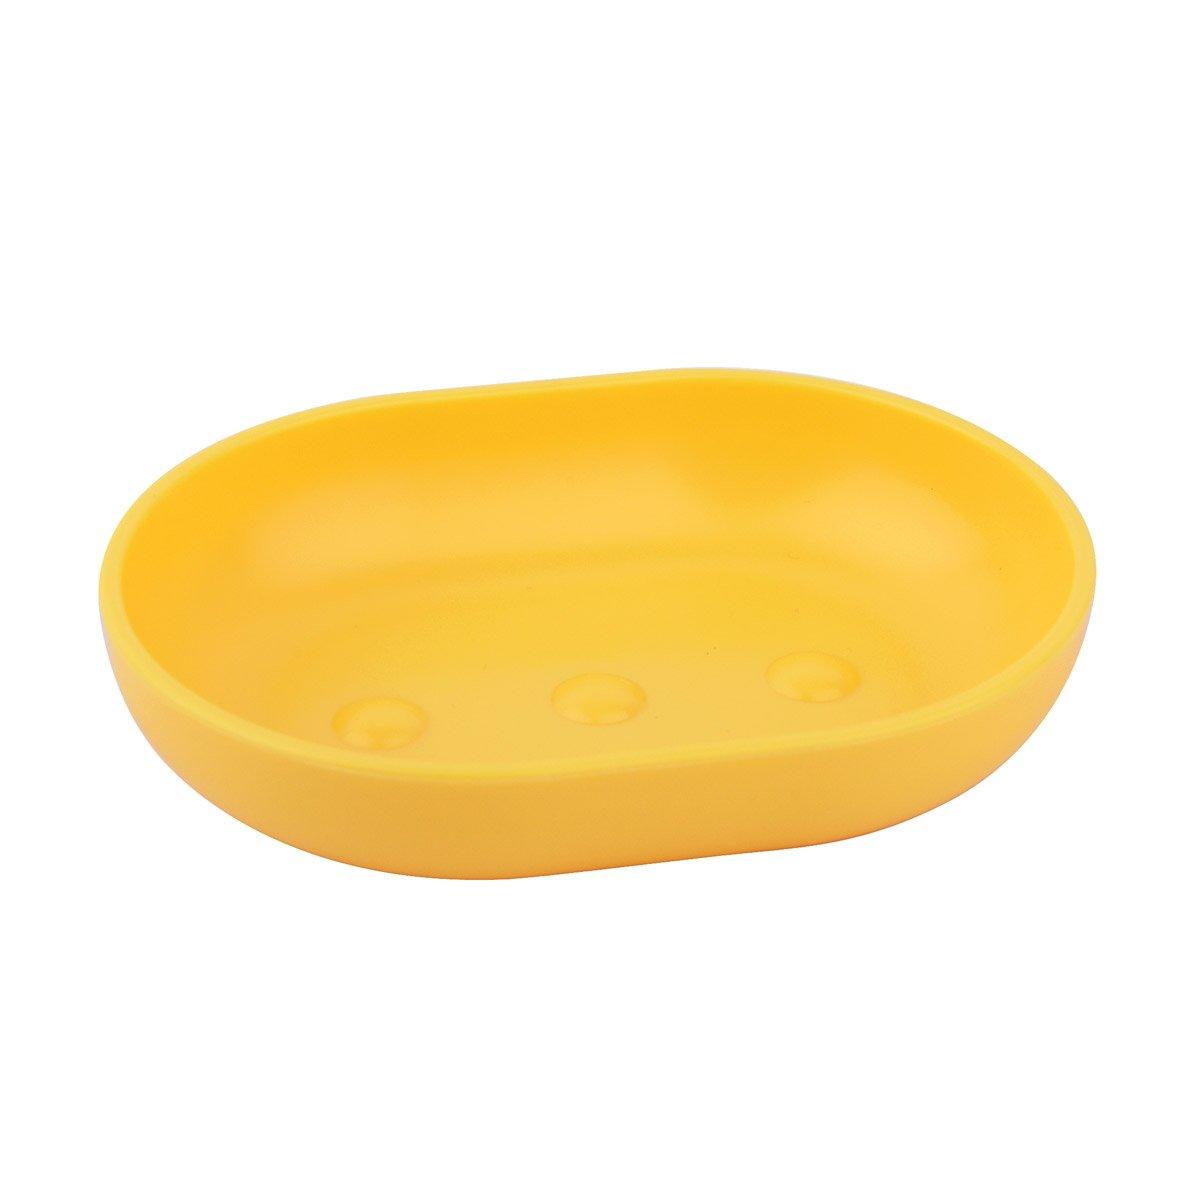 Porte-savon plastique Easy, banana n°4